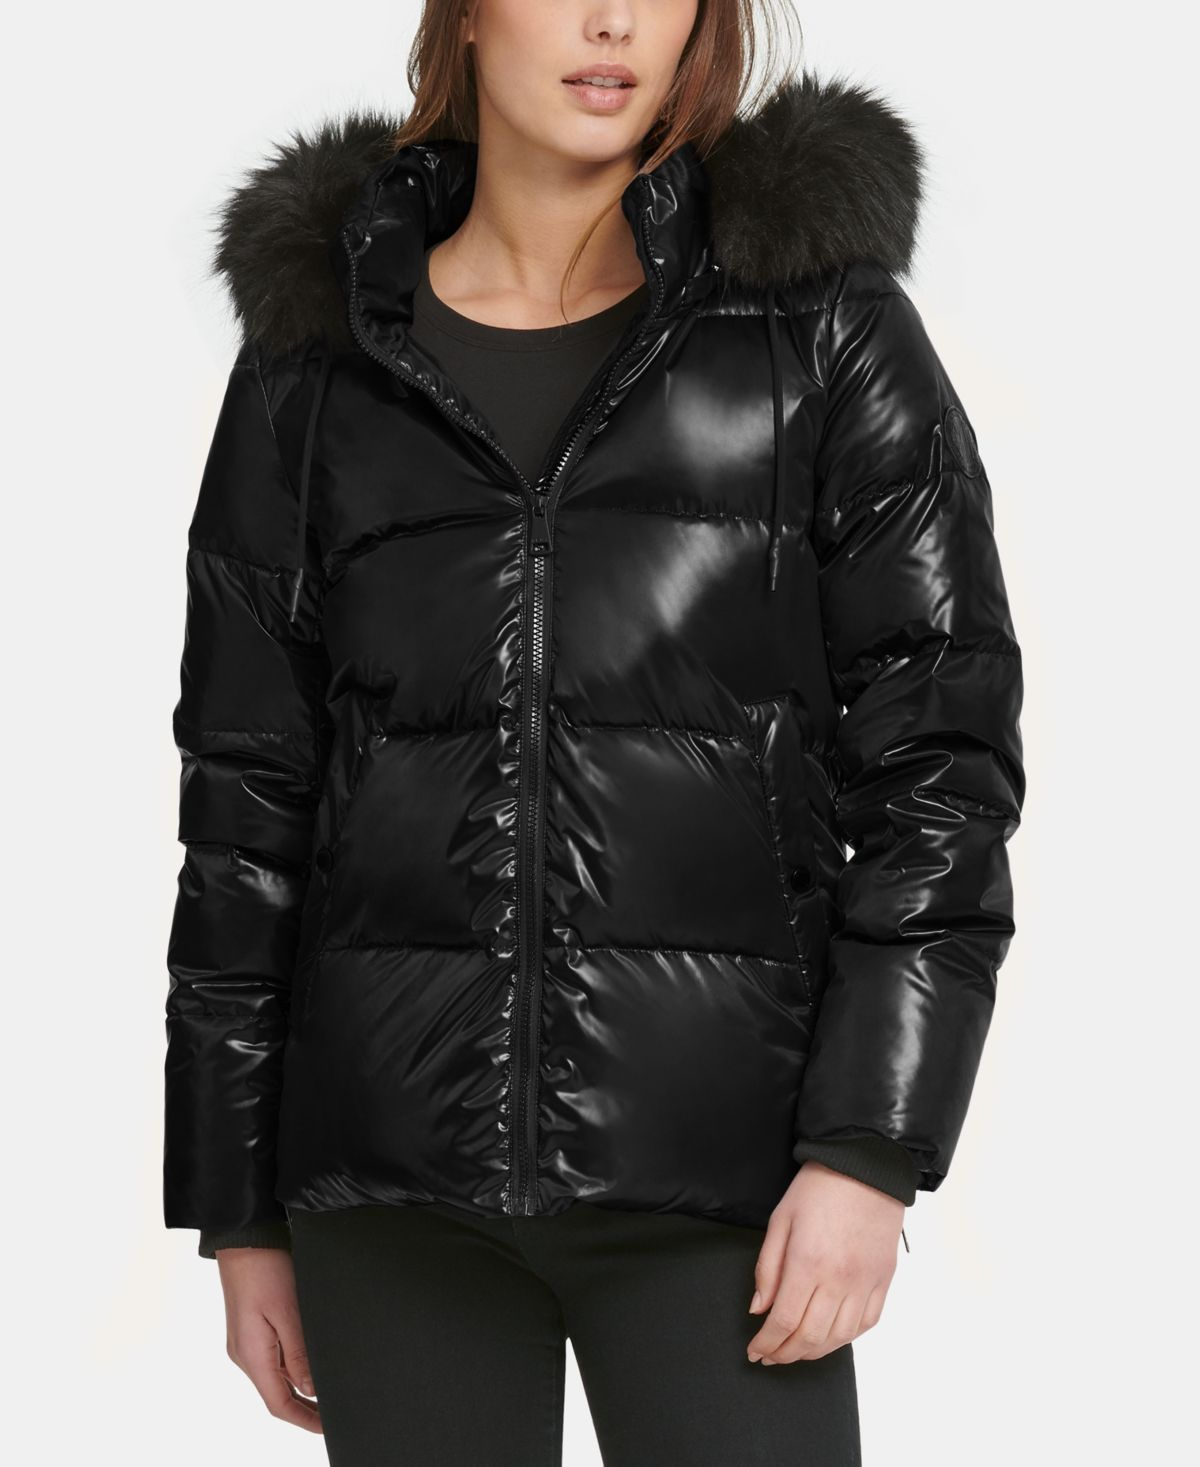 Dkny High Shine Faux Fur Trim Puffer Coat Black Puffer Coat Leggings Are Not Pants Coats For Women [ 1467 x 1200 Pixel ]